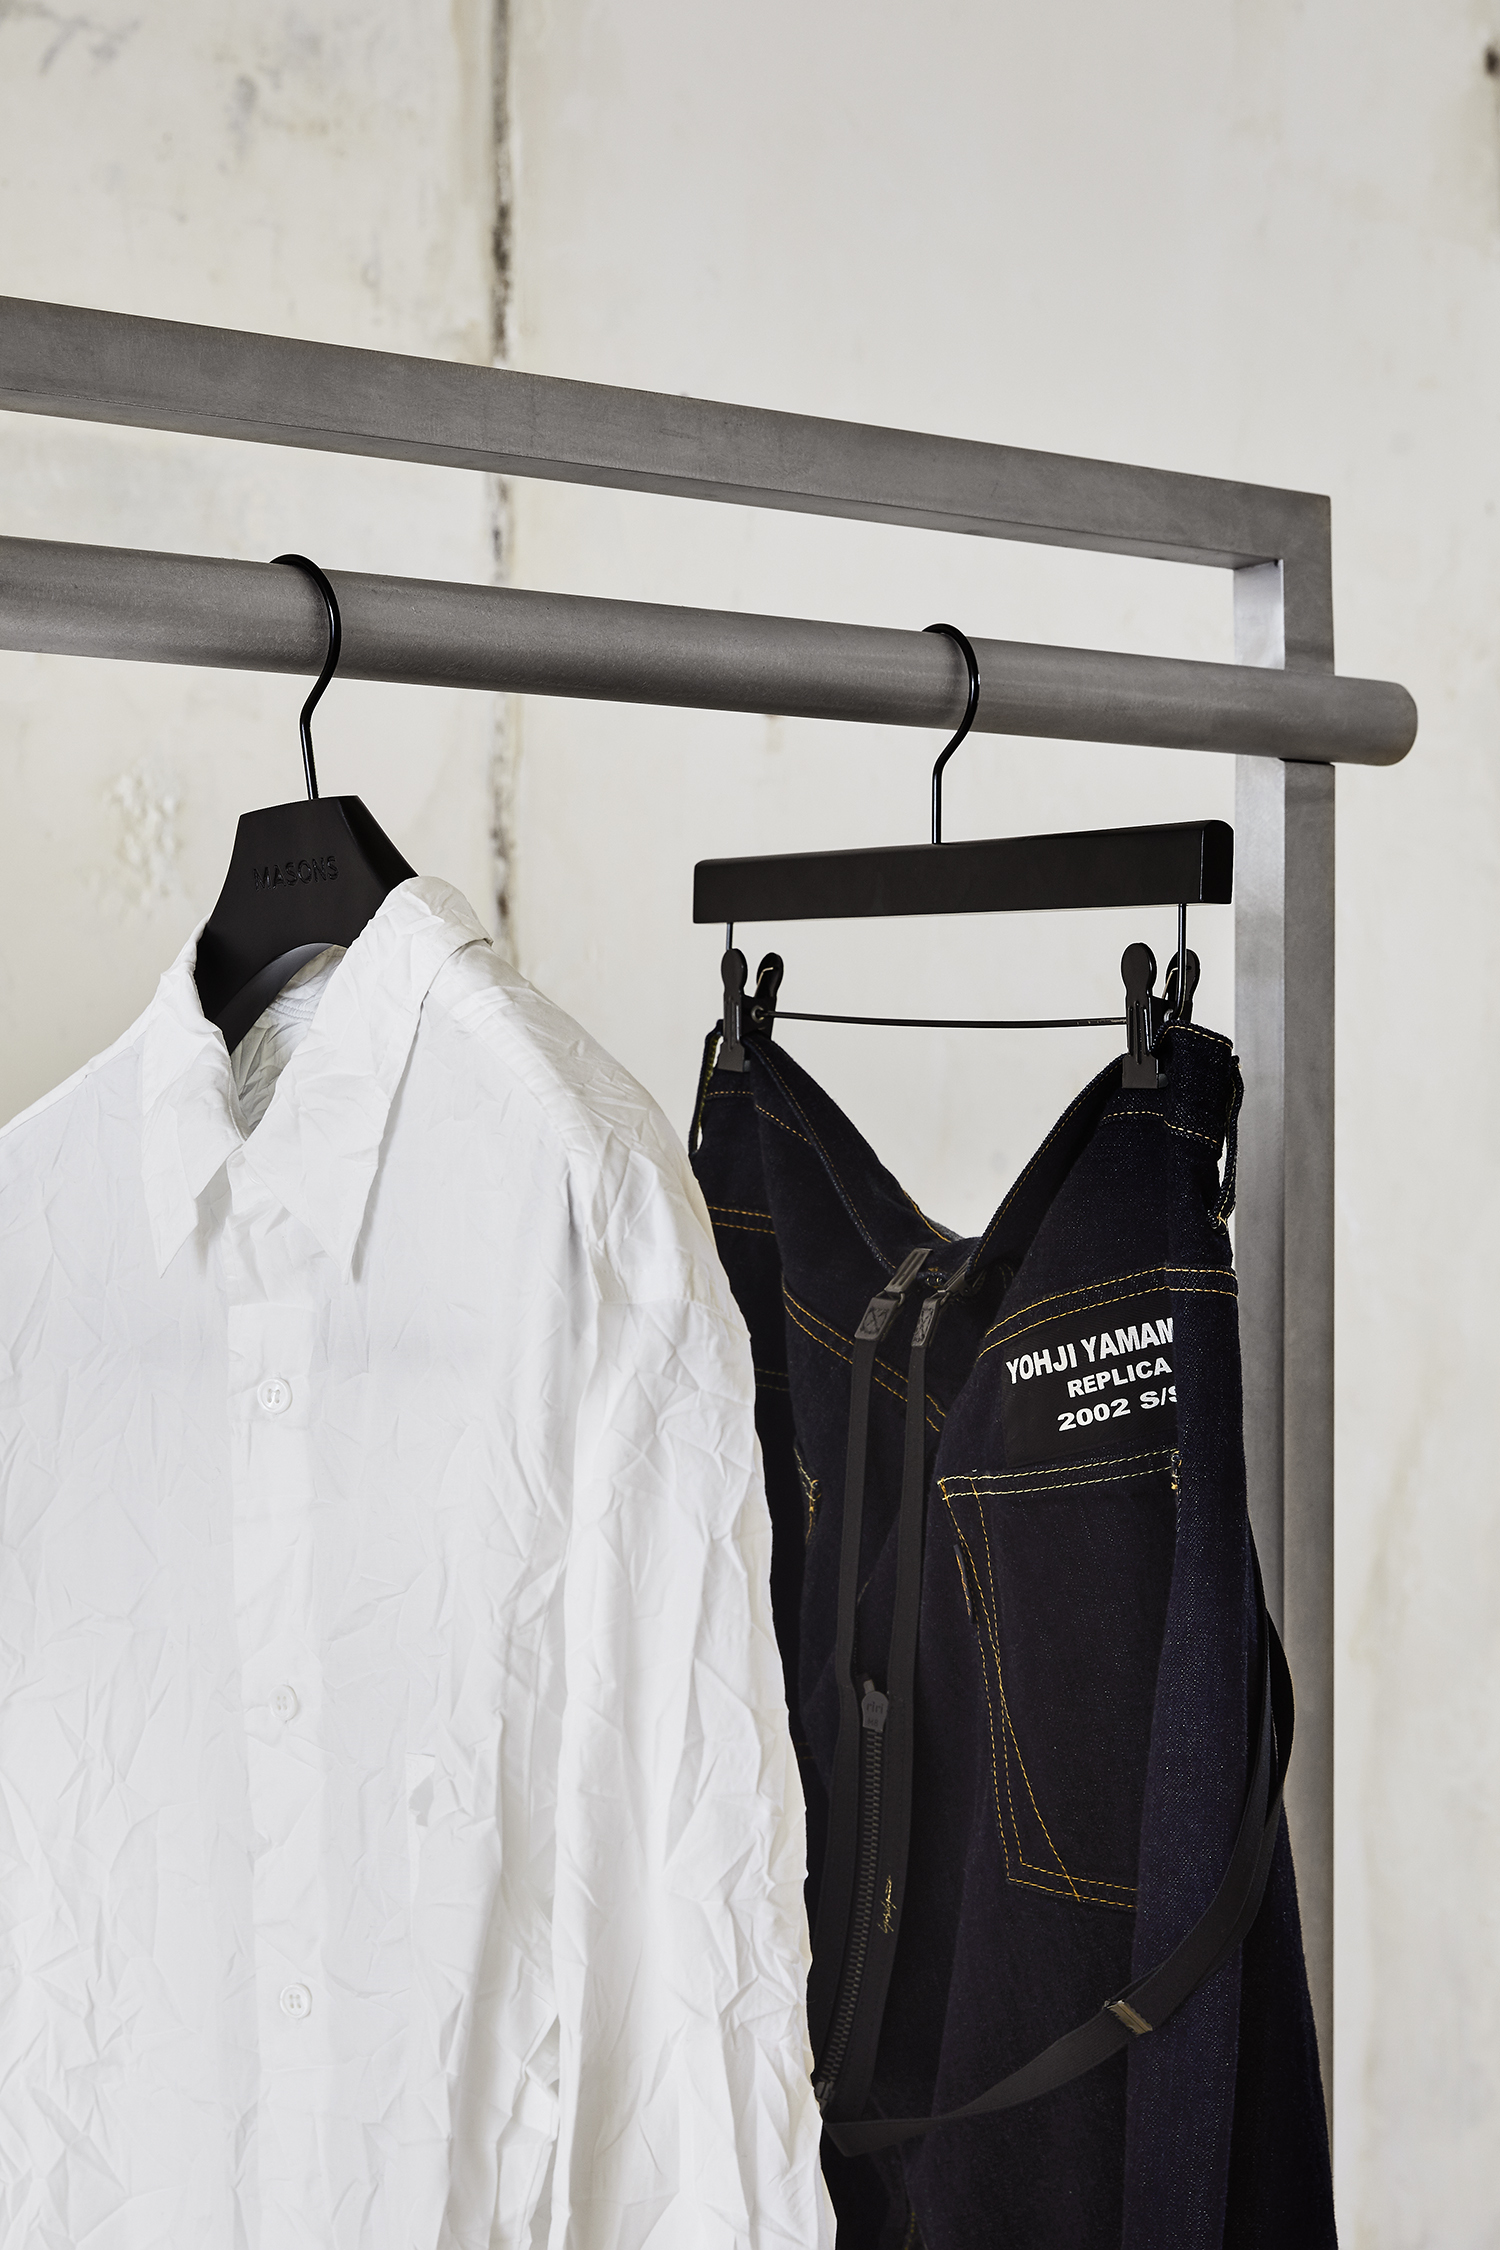 NO 3 Our Clothes Rack04